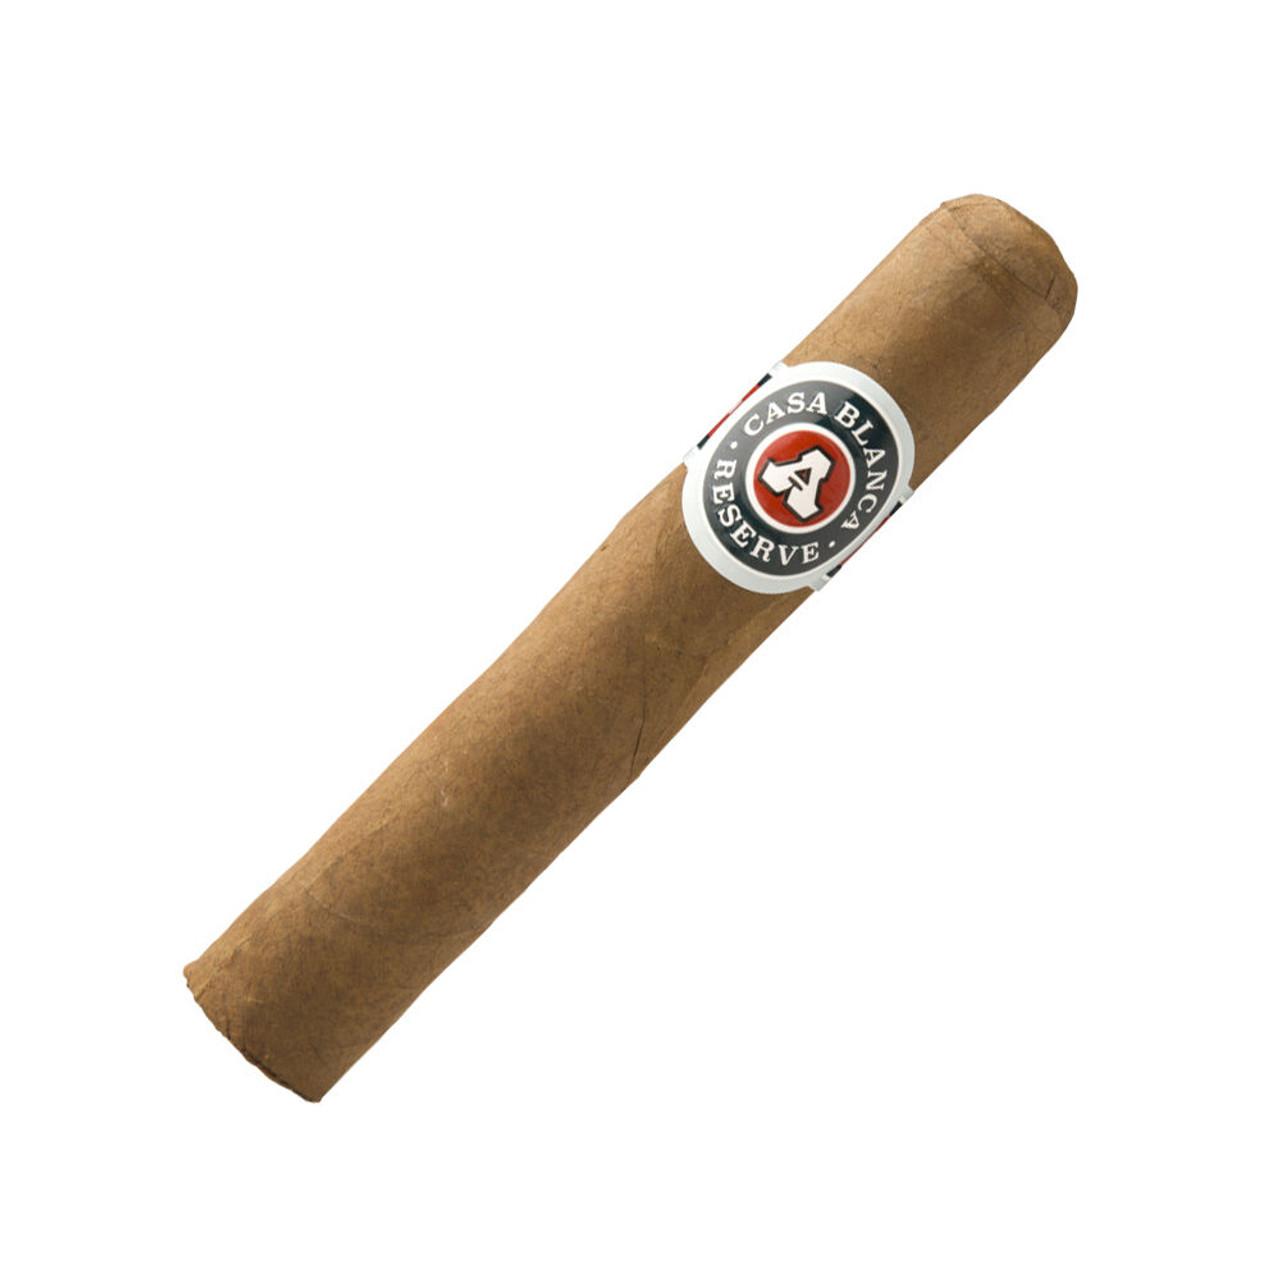 Casa Blanca Reserve Robusto Cigars - 5 x 52 (Bundle of 20)